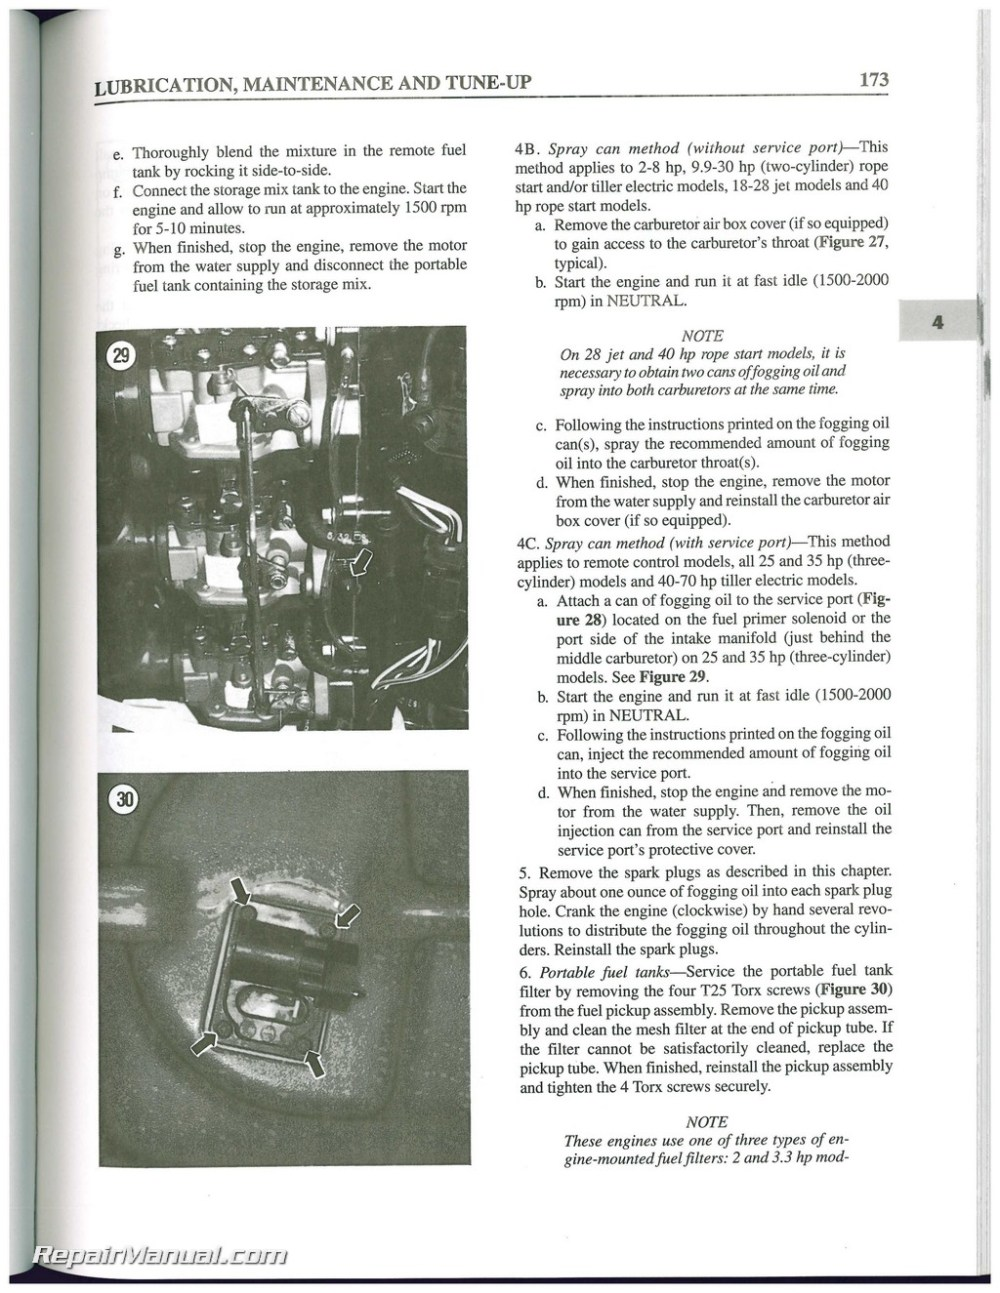 medium resolution of used evinrude johnson 2 70 hp 2 stroke outboard boat shop manual 1995 1996 1997 1998